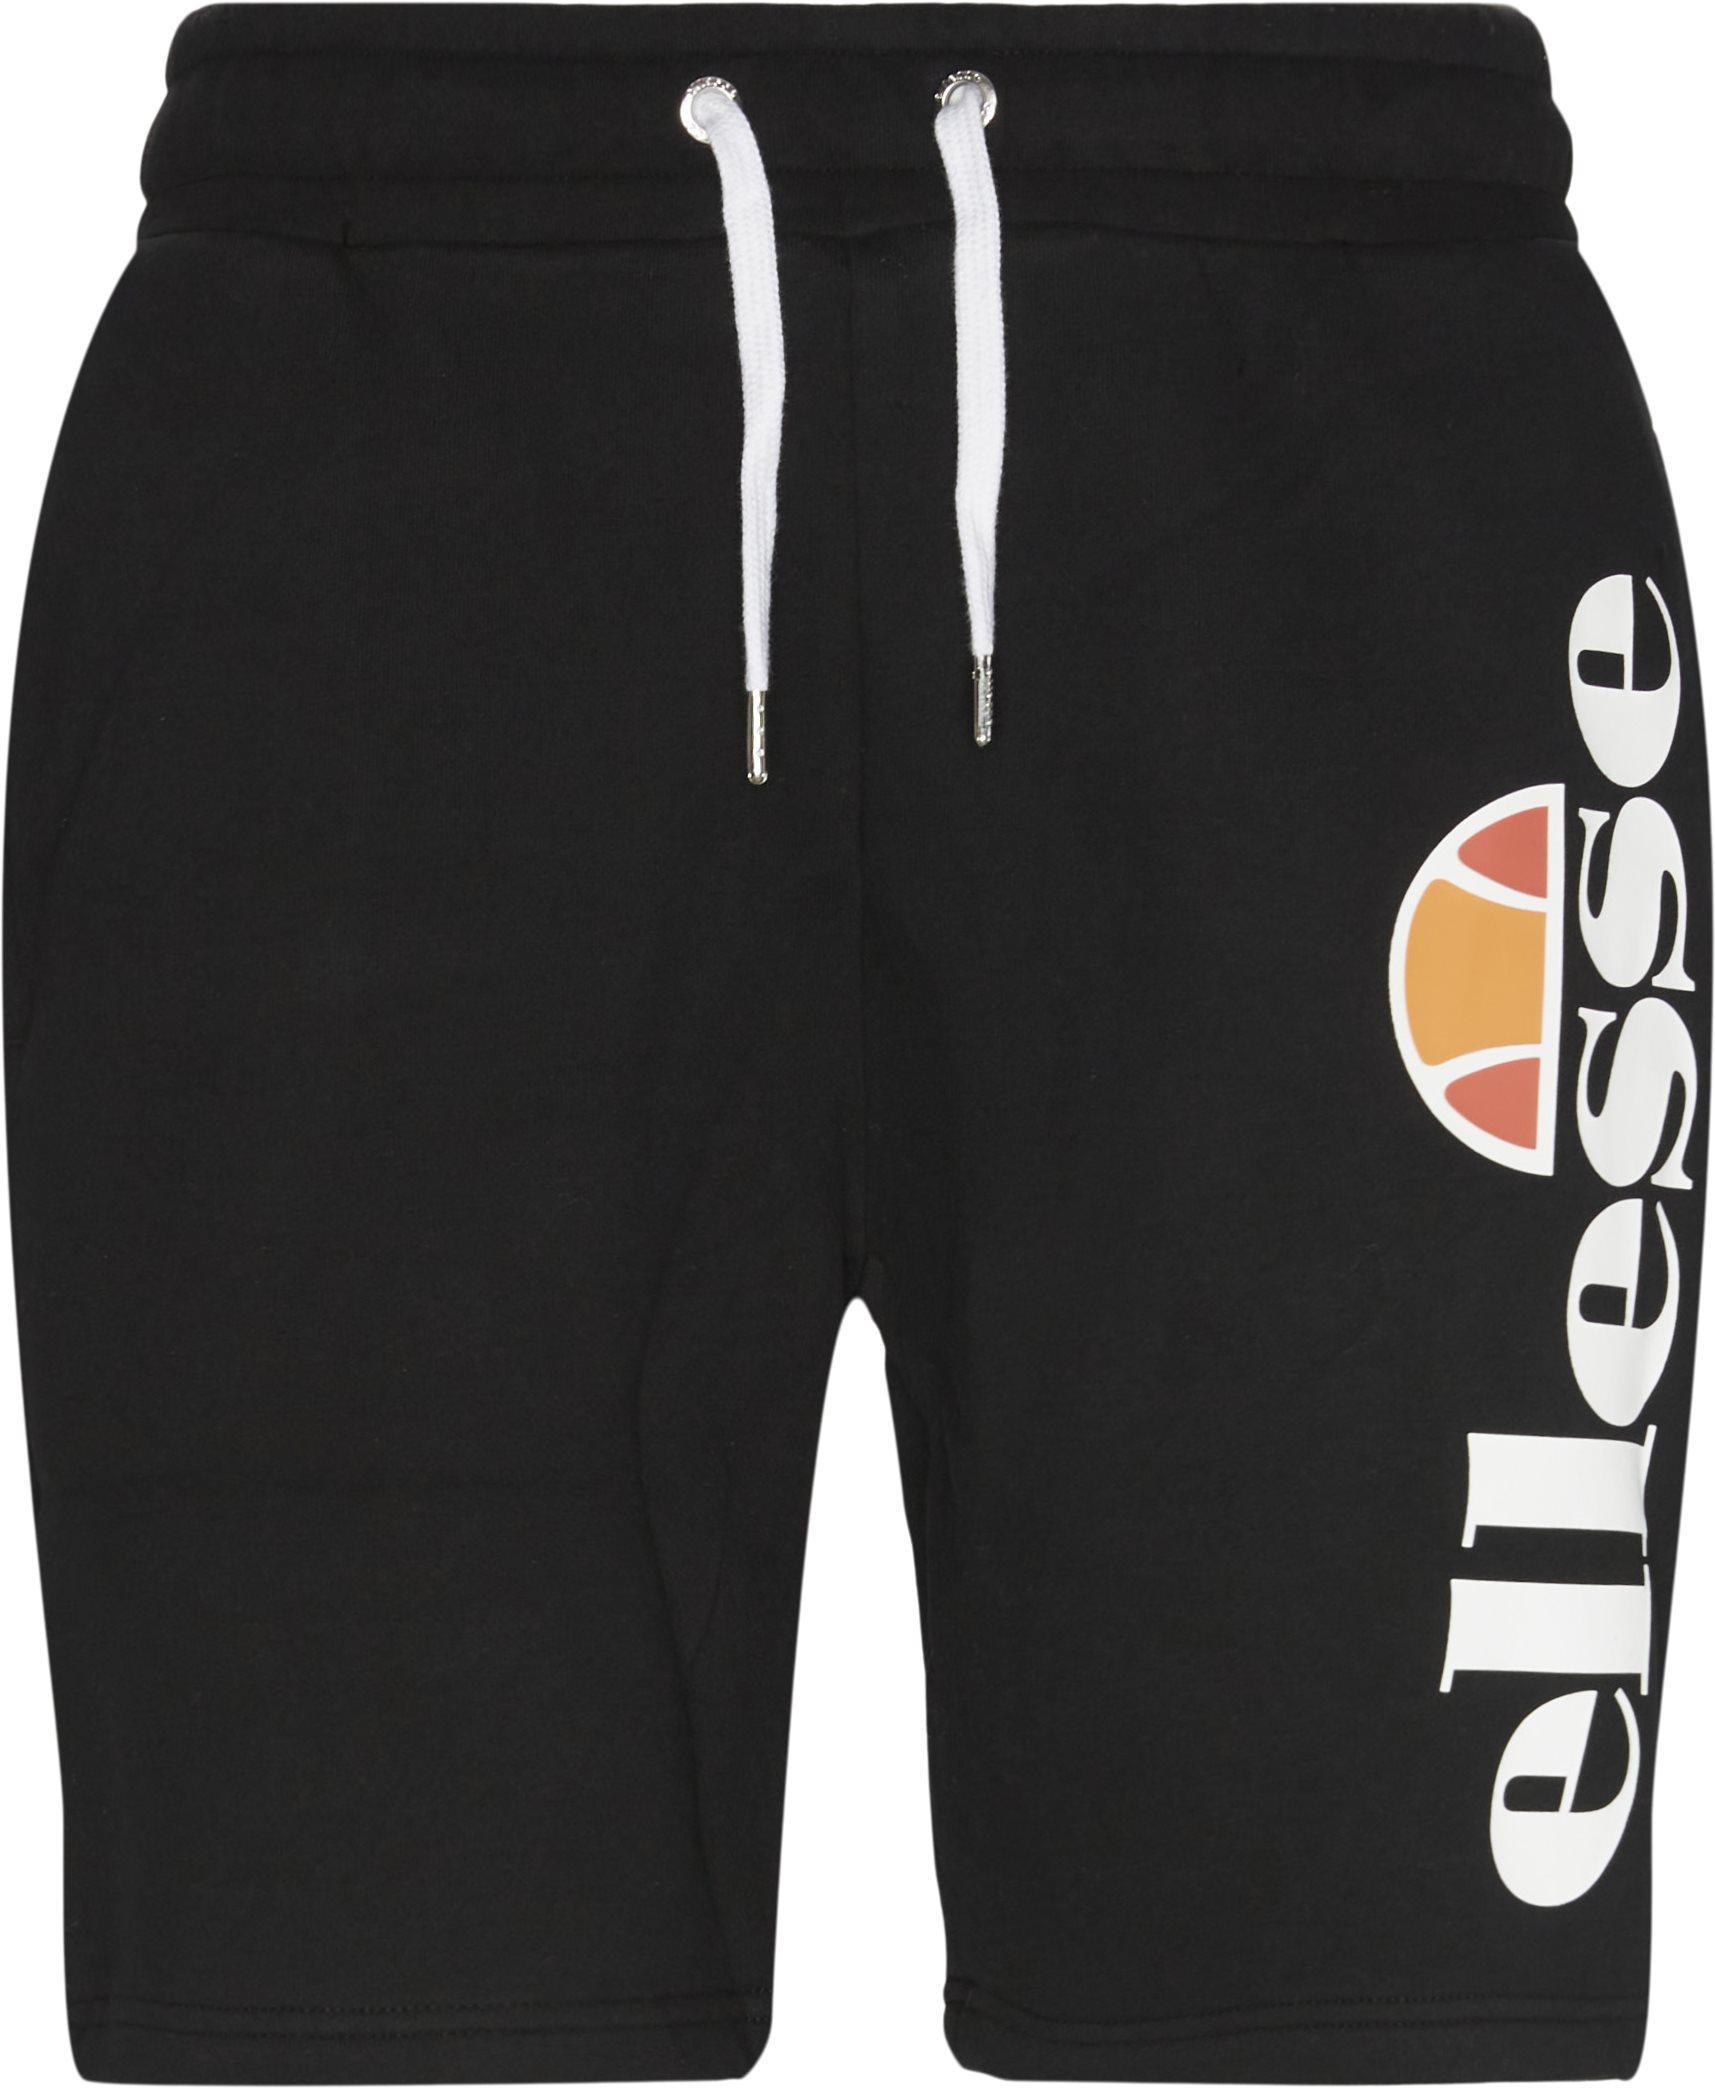 Bossini Fleece Shorts - Shorts - Regular fit - Sort